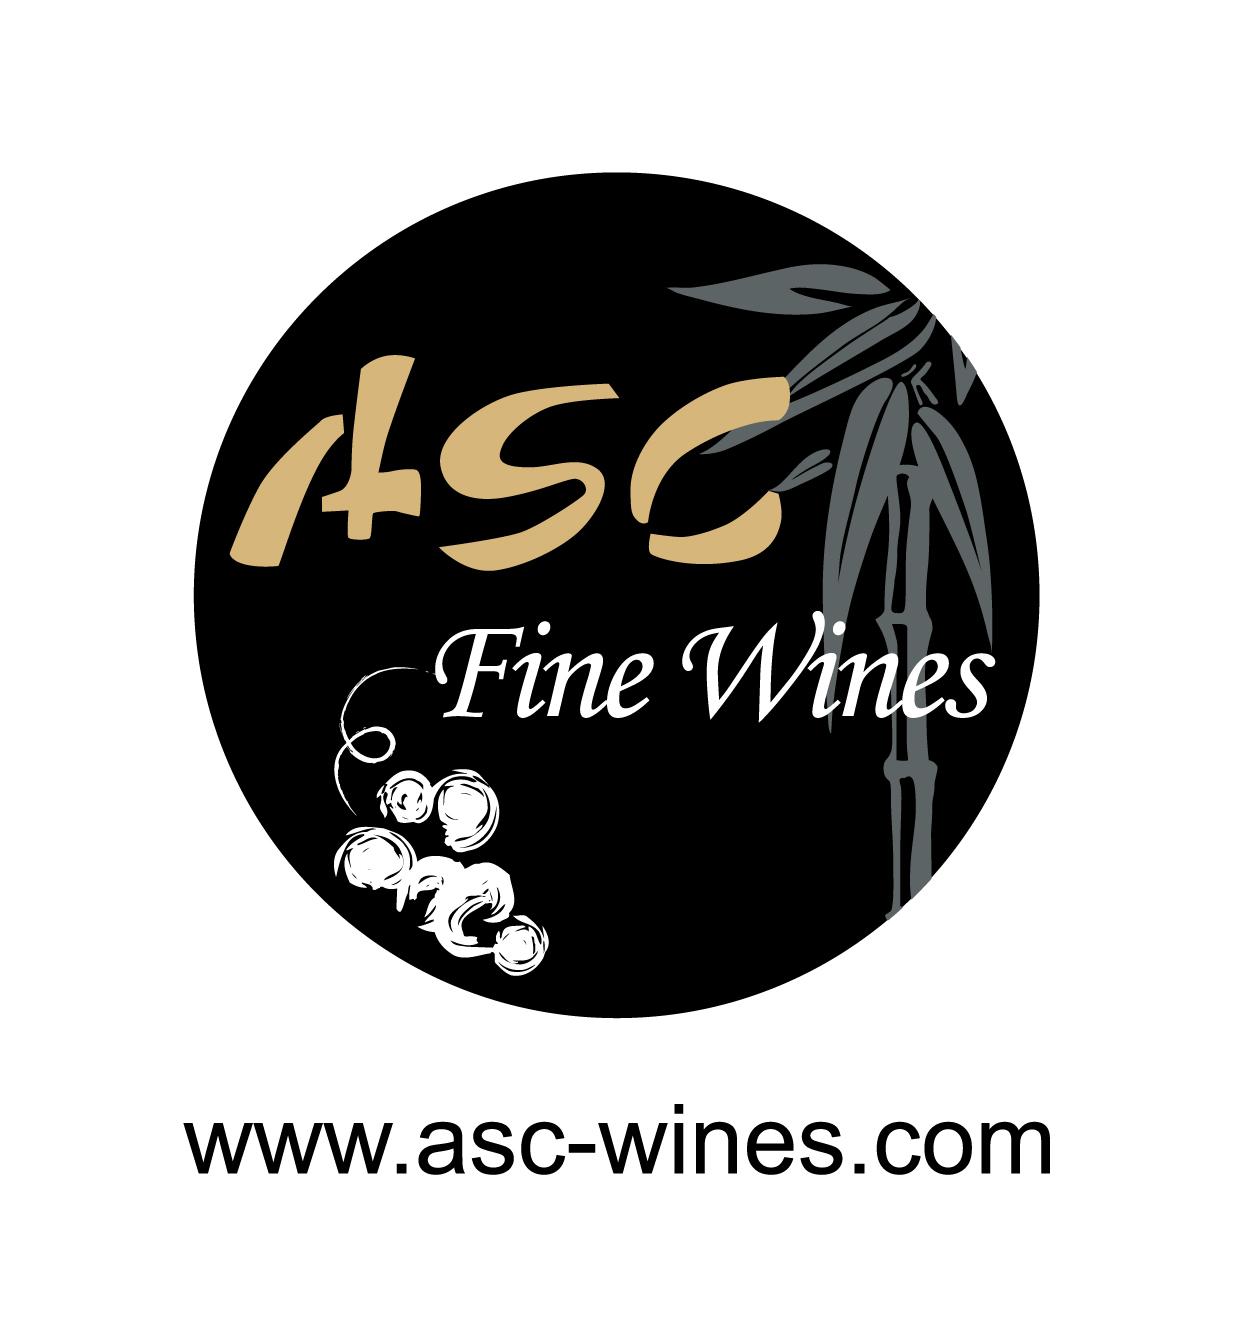 ASC获三得利2.31亿元增资,资金规划首度披露:做优产品,拓展市场是重点!